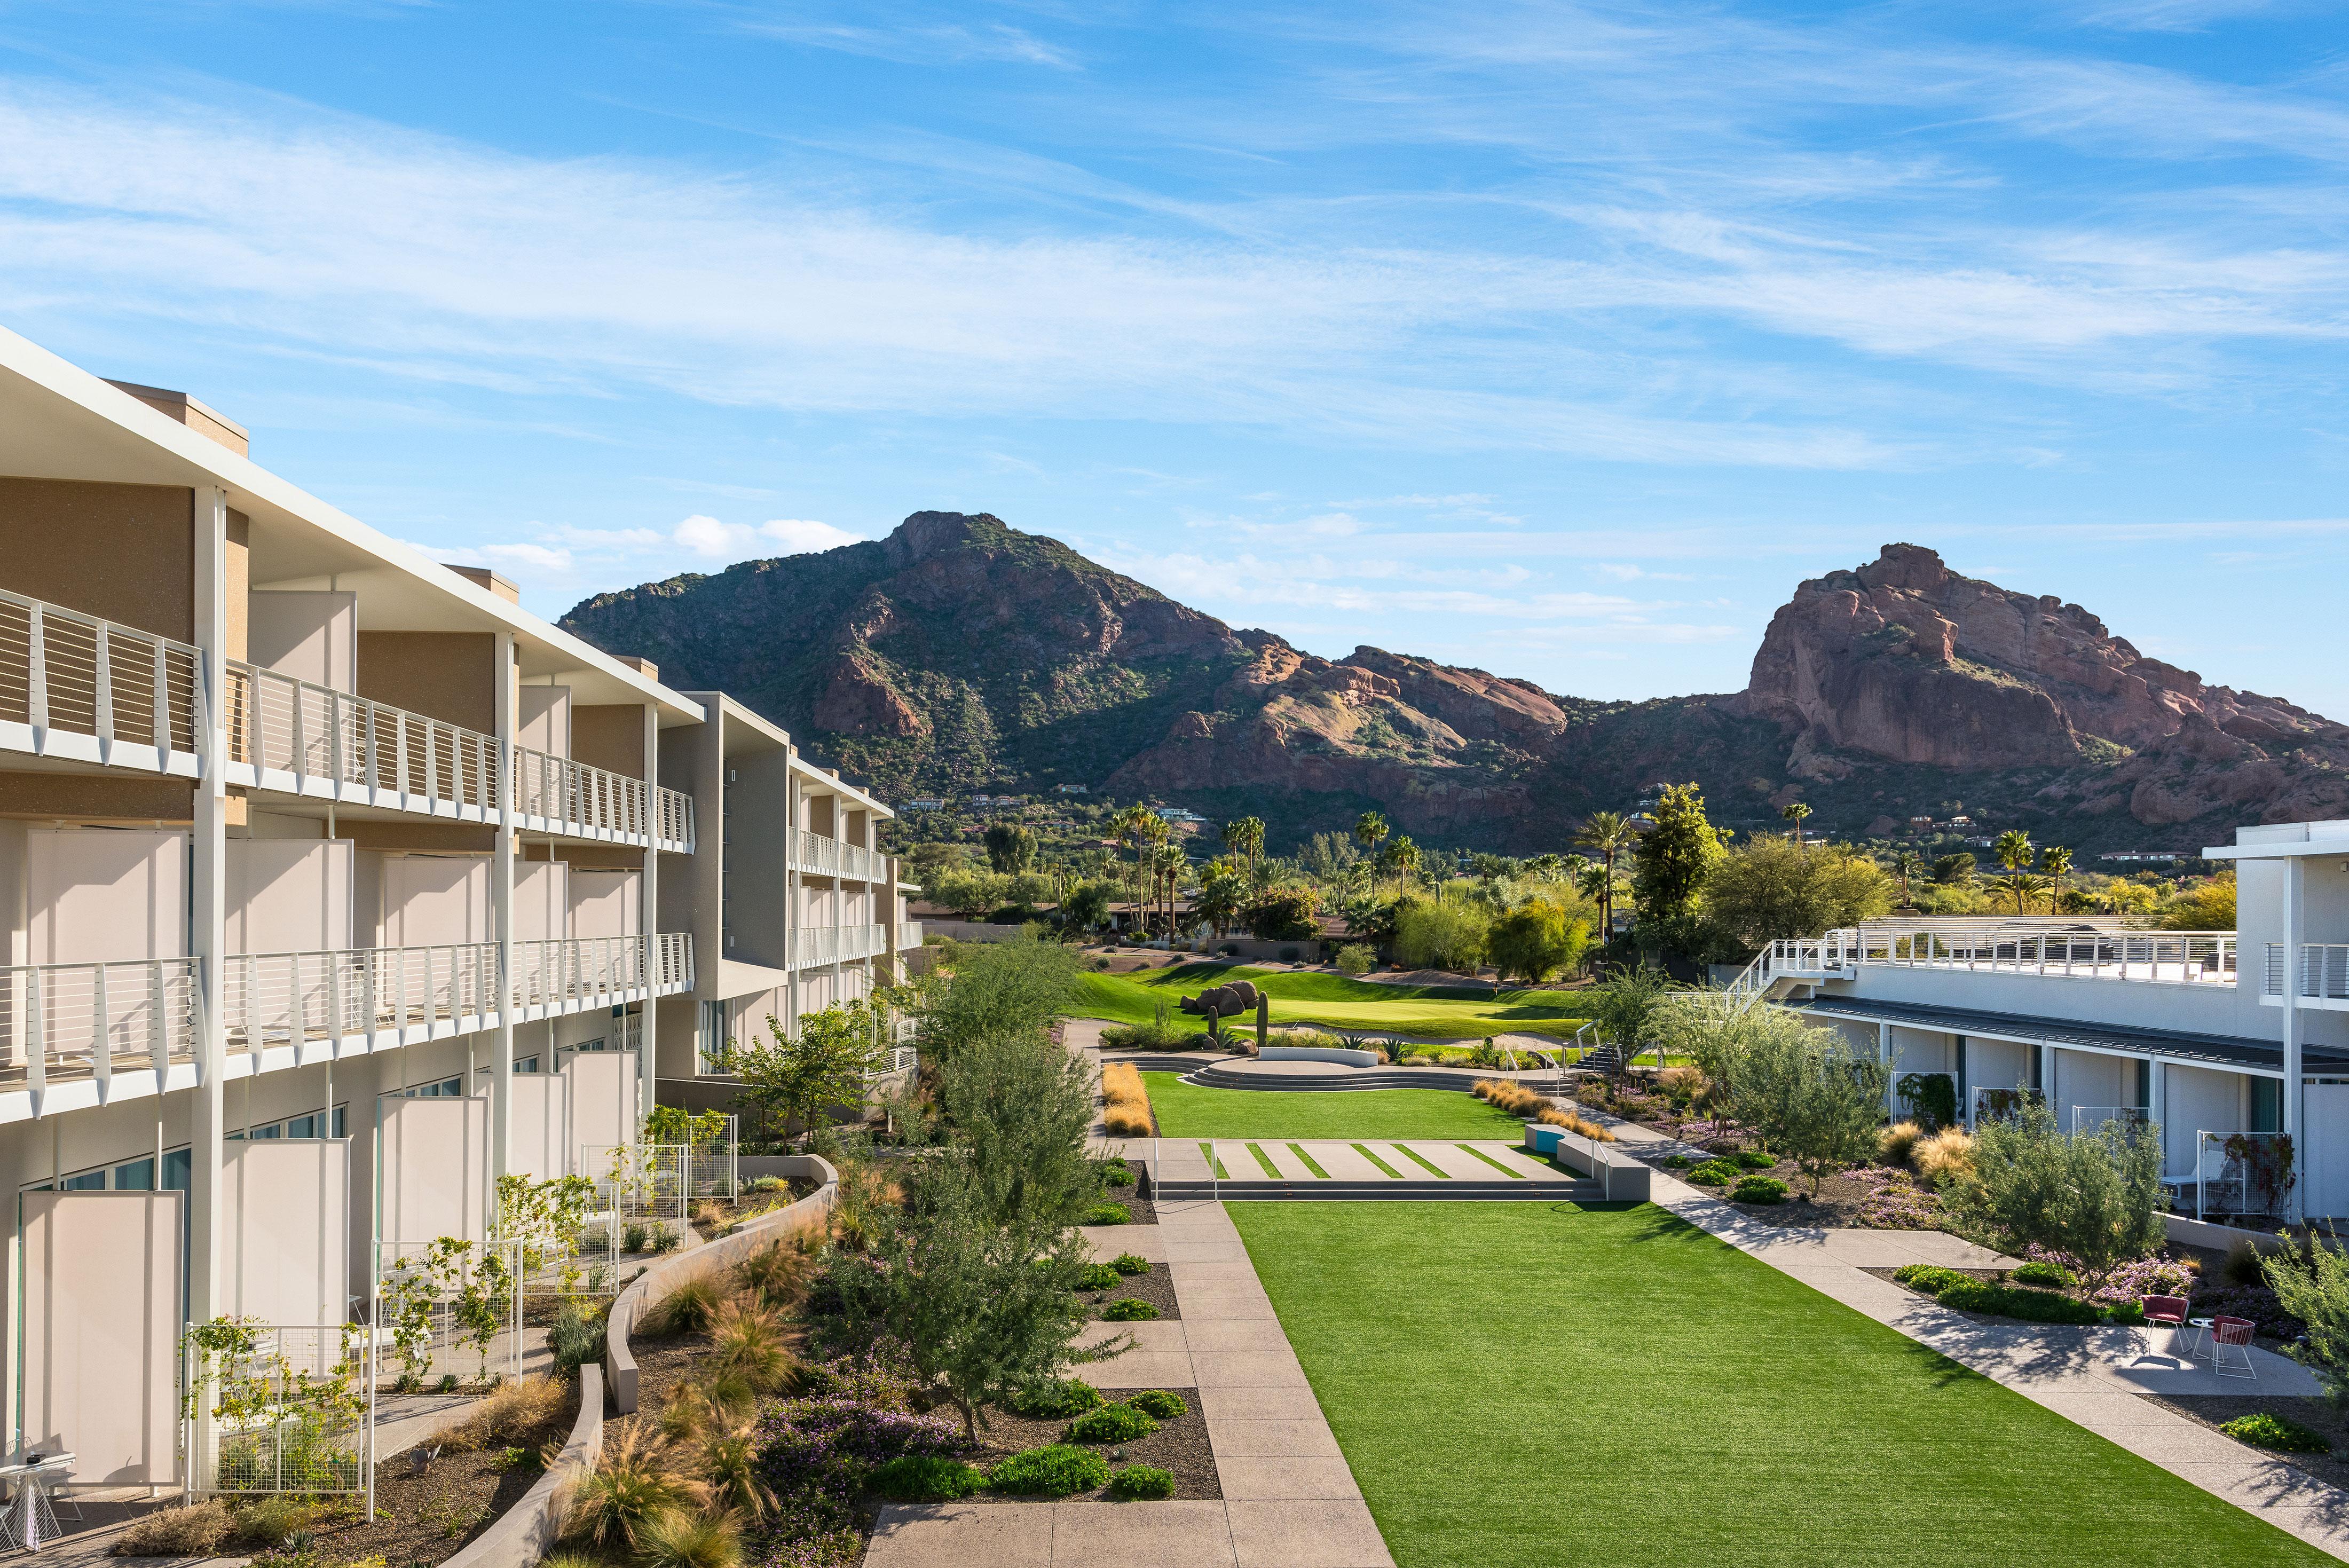 phoenix hotels arizona travel design destination mountain shadows resort camelback mountain